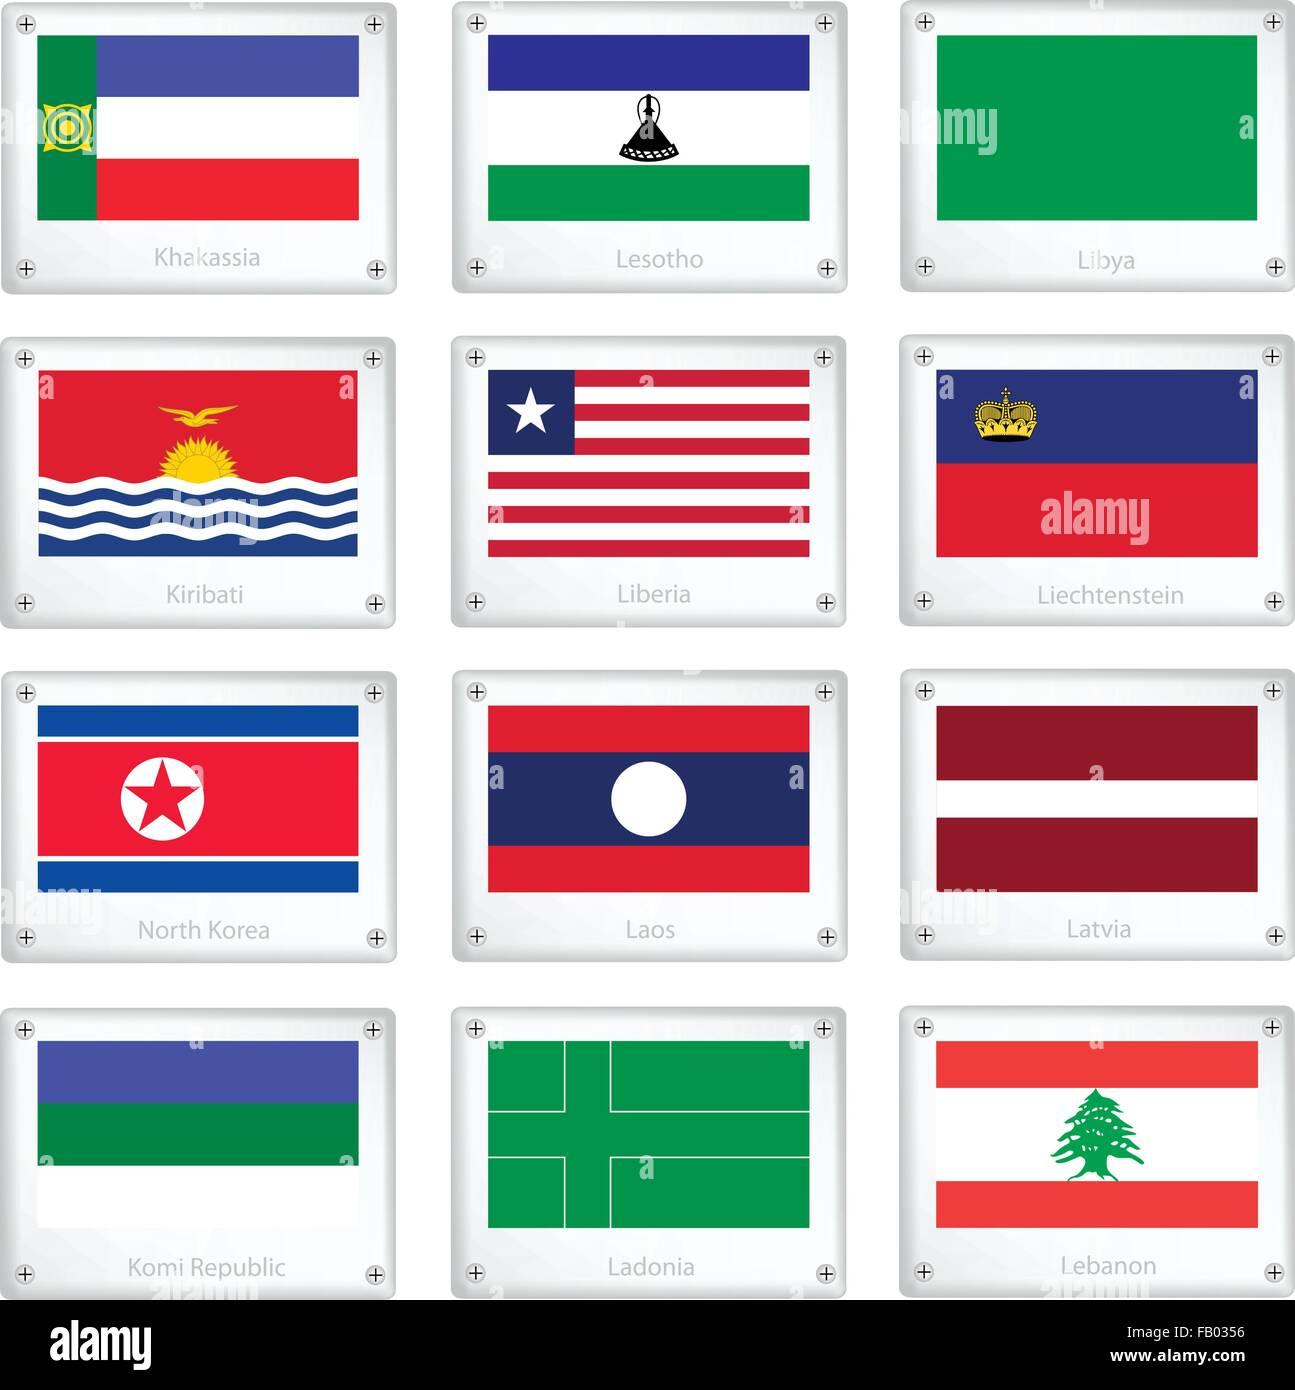 National Flags of Khakassia, Lesotho, Libya, Kiribati, Liberia, Liechtenstein, North Korea, Laos, Latvia, Komi Republic, - Stock Vector